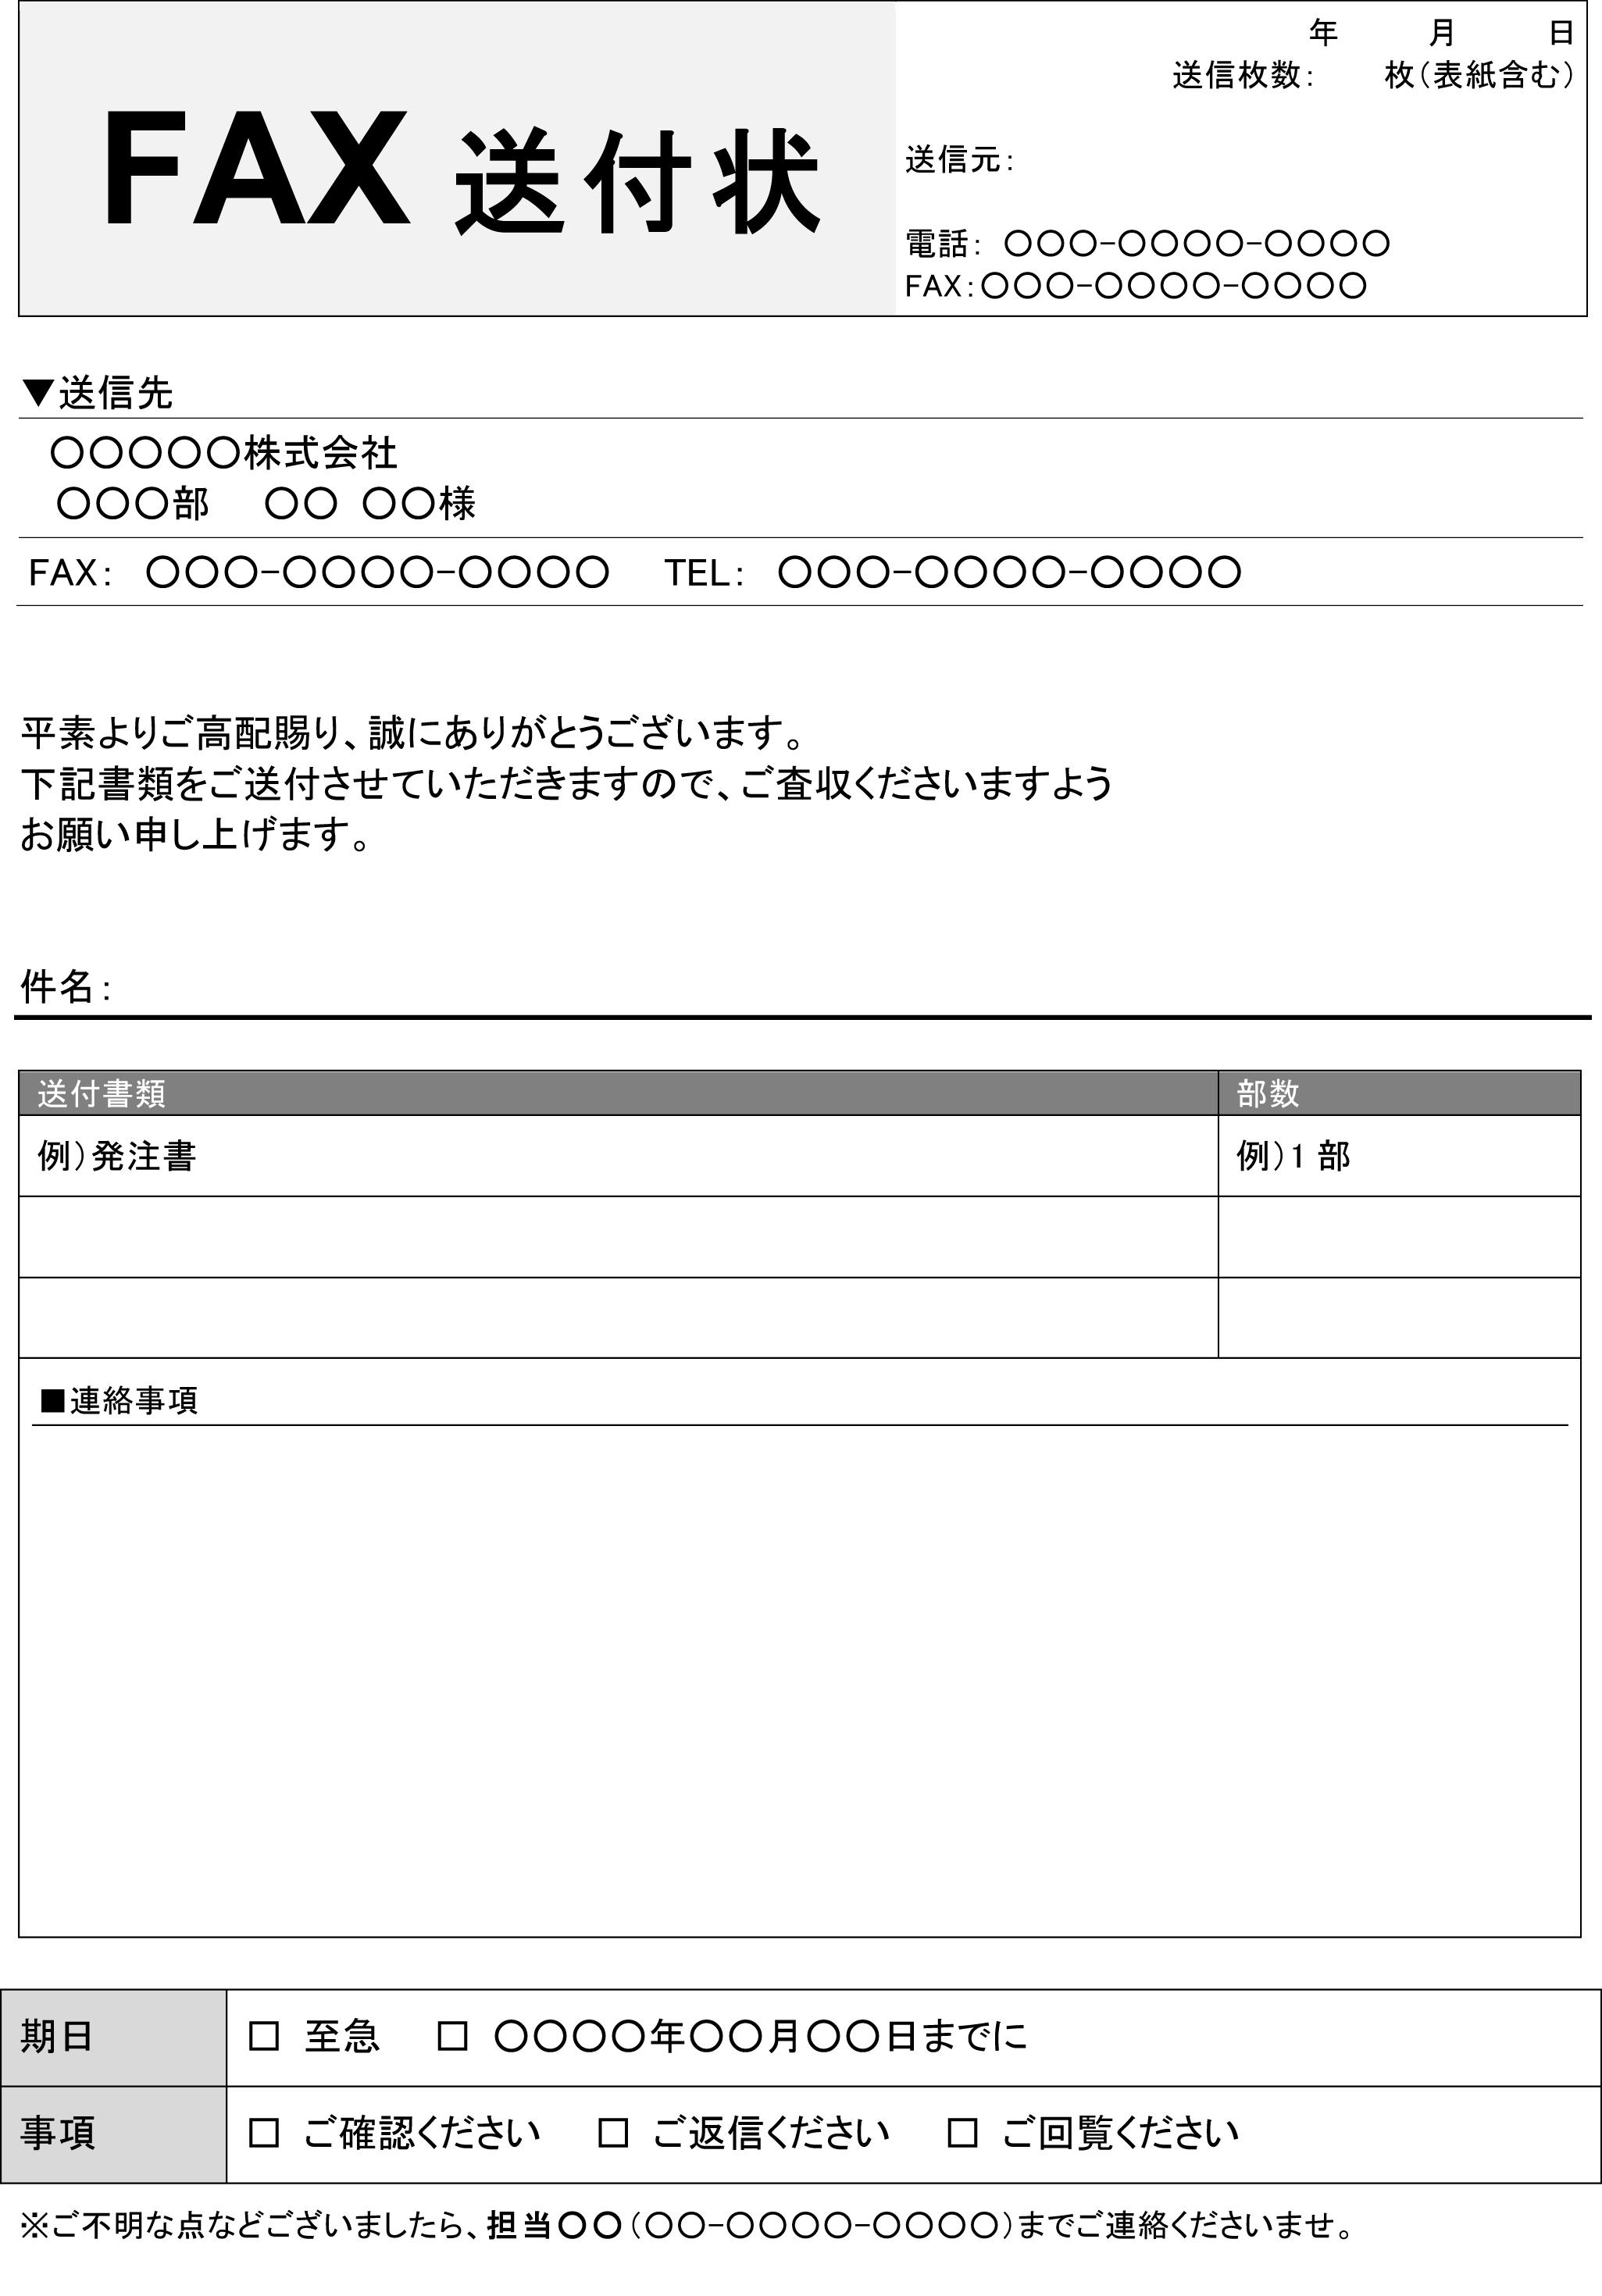 fax送付状_4